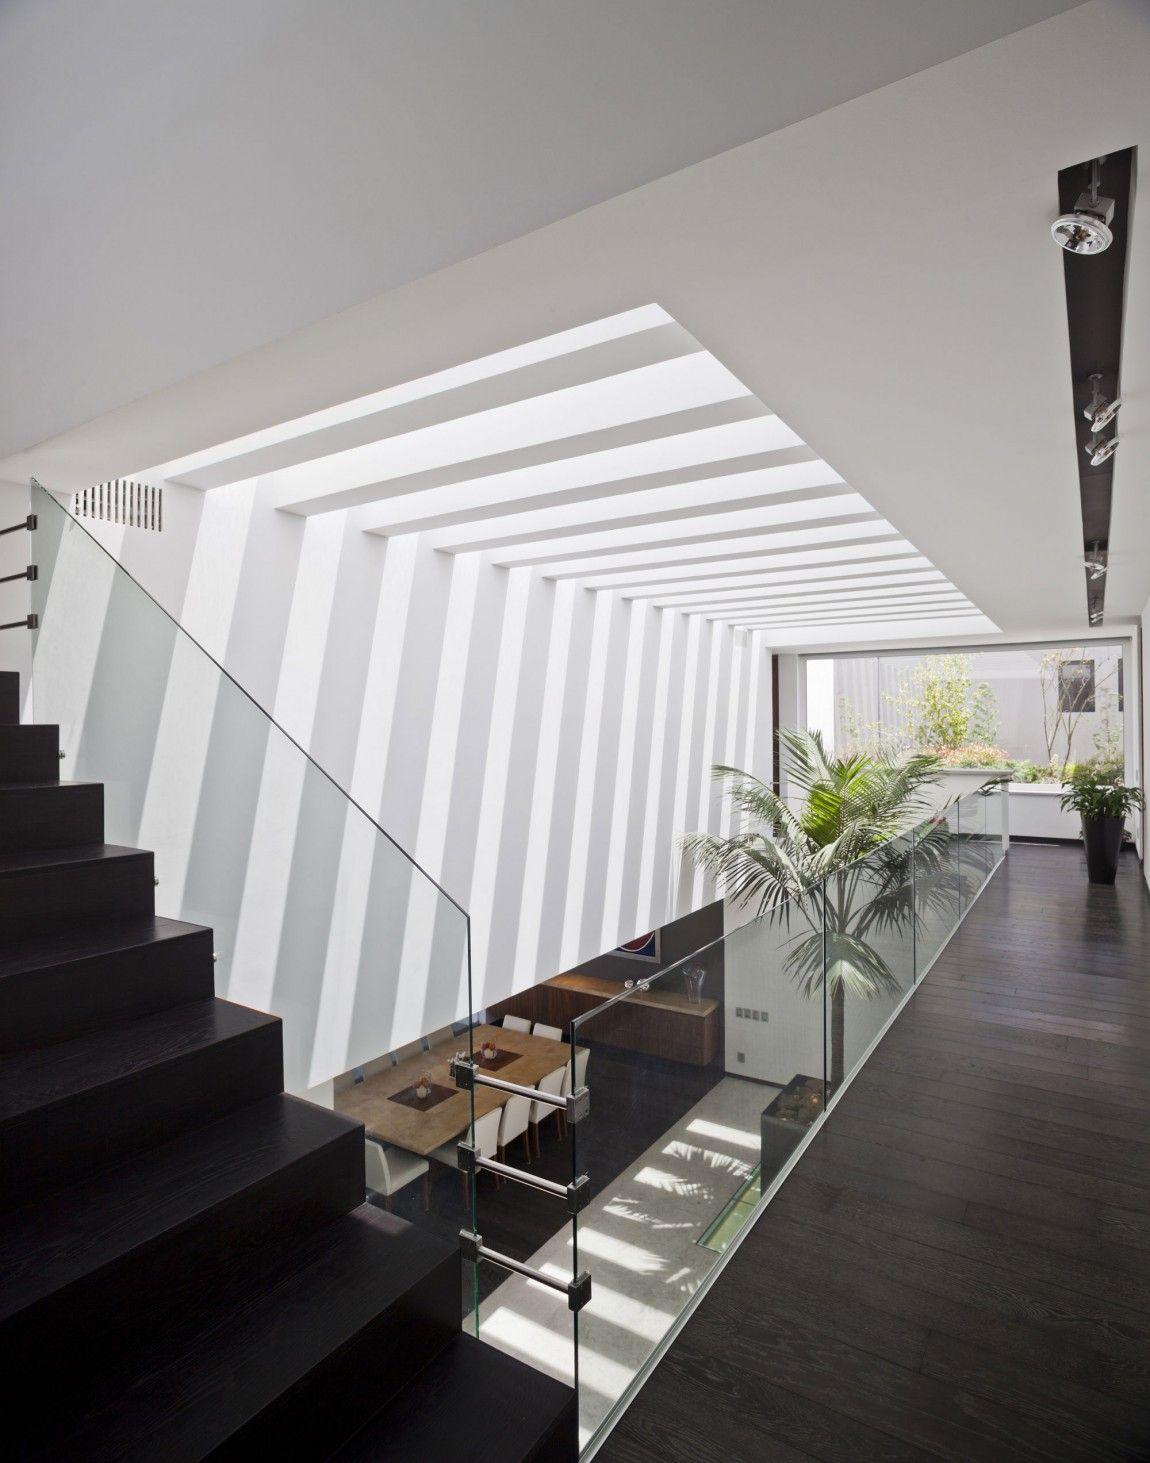 Imposing Modern Residence Inspiring Openness: Casa Río Hondo